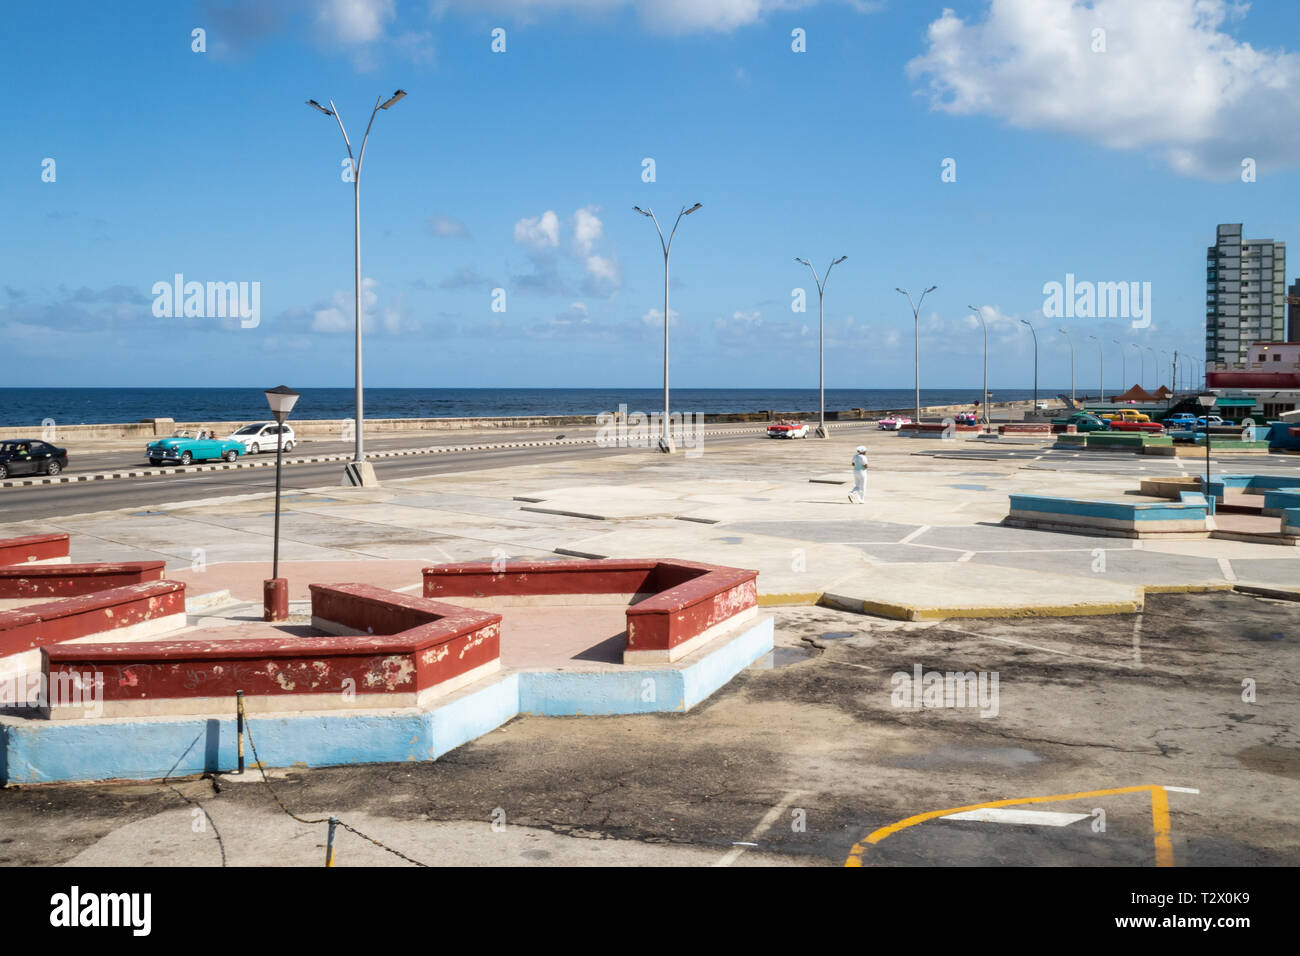 Along the Malecon, Havana, Cuba, 1950s recreation area - Stock Image